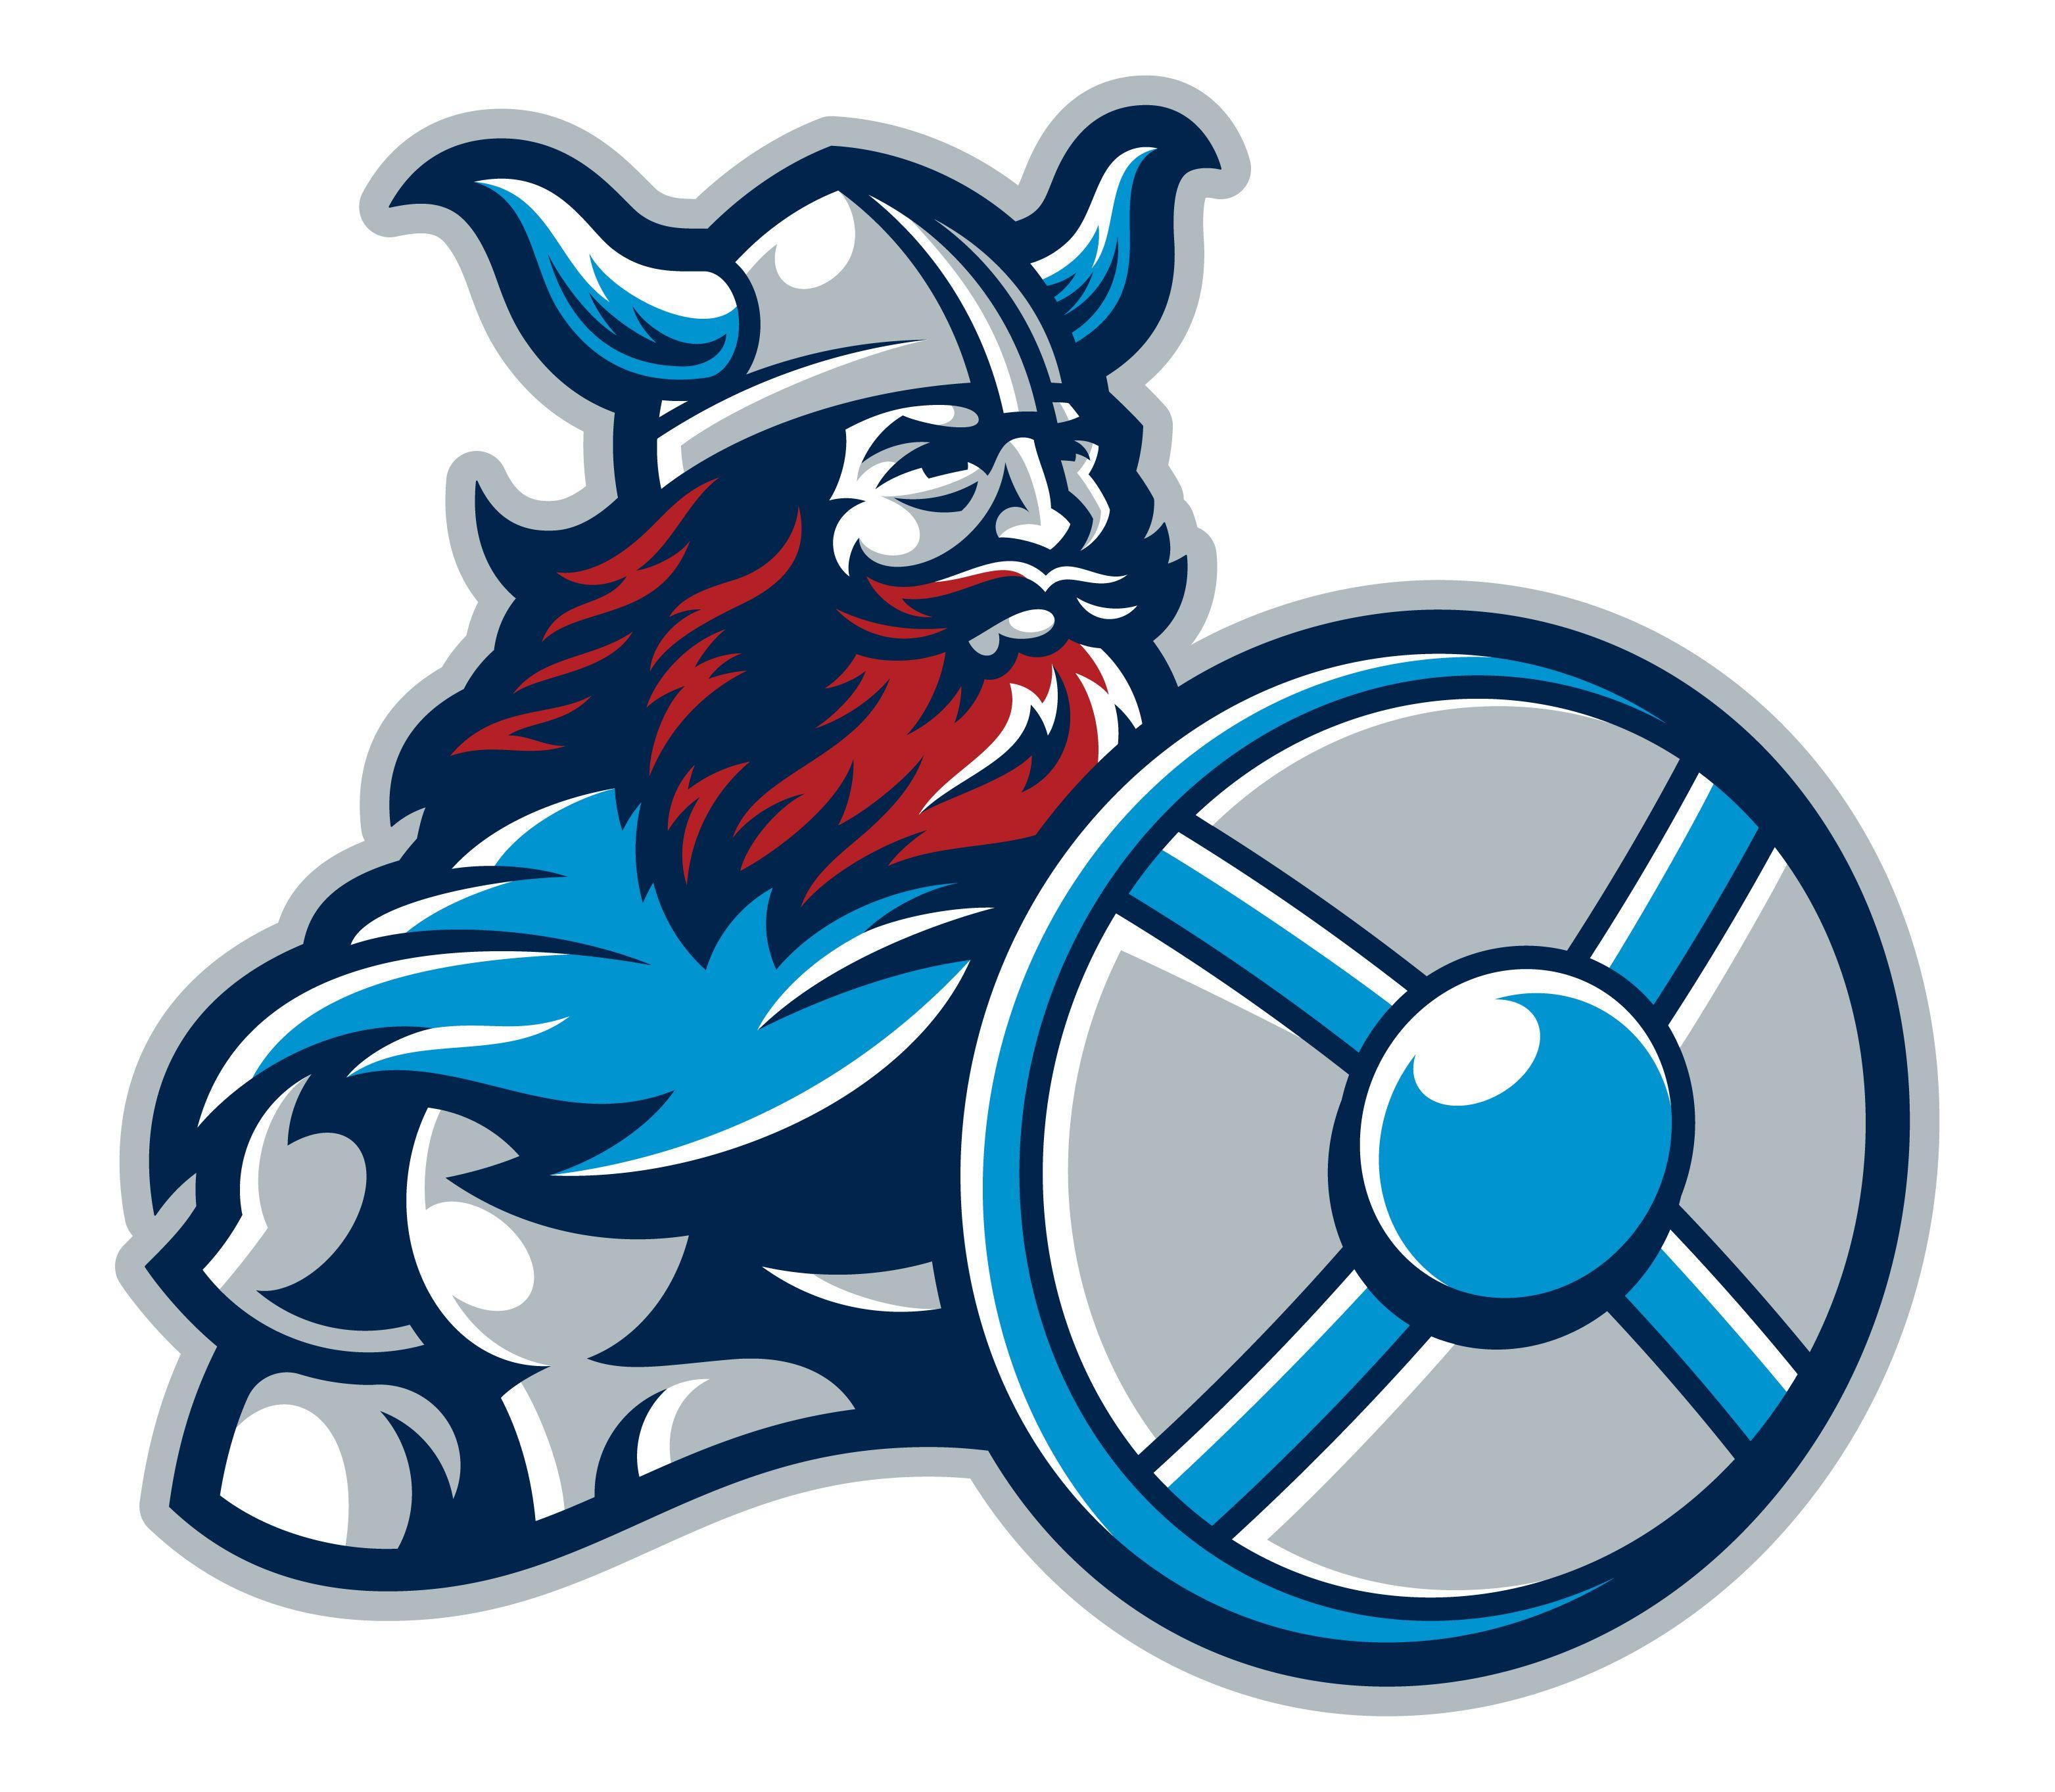 Rebrand of local High School. Mascot design, Viking logo